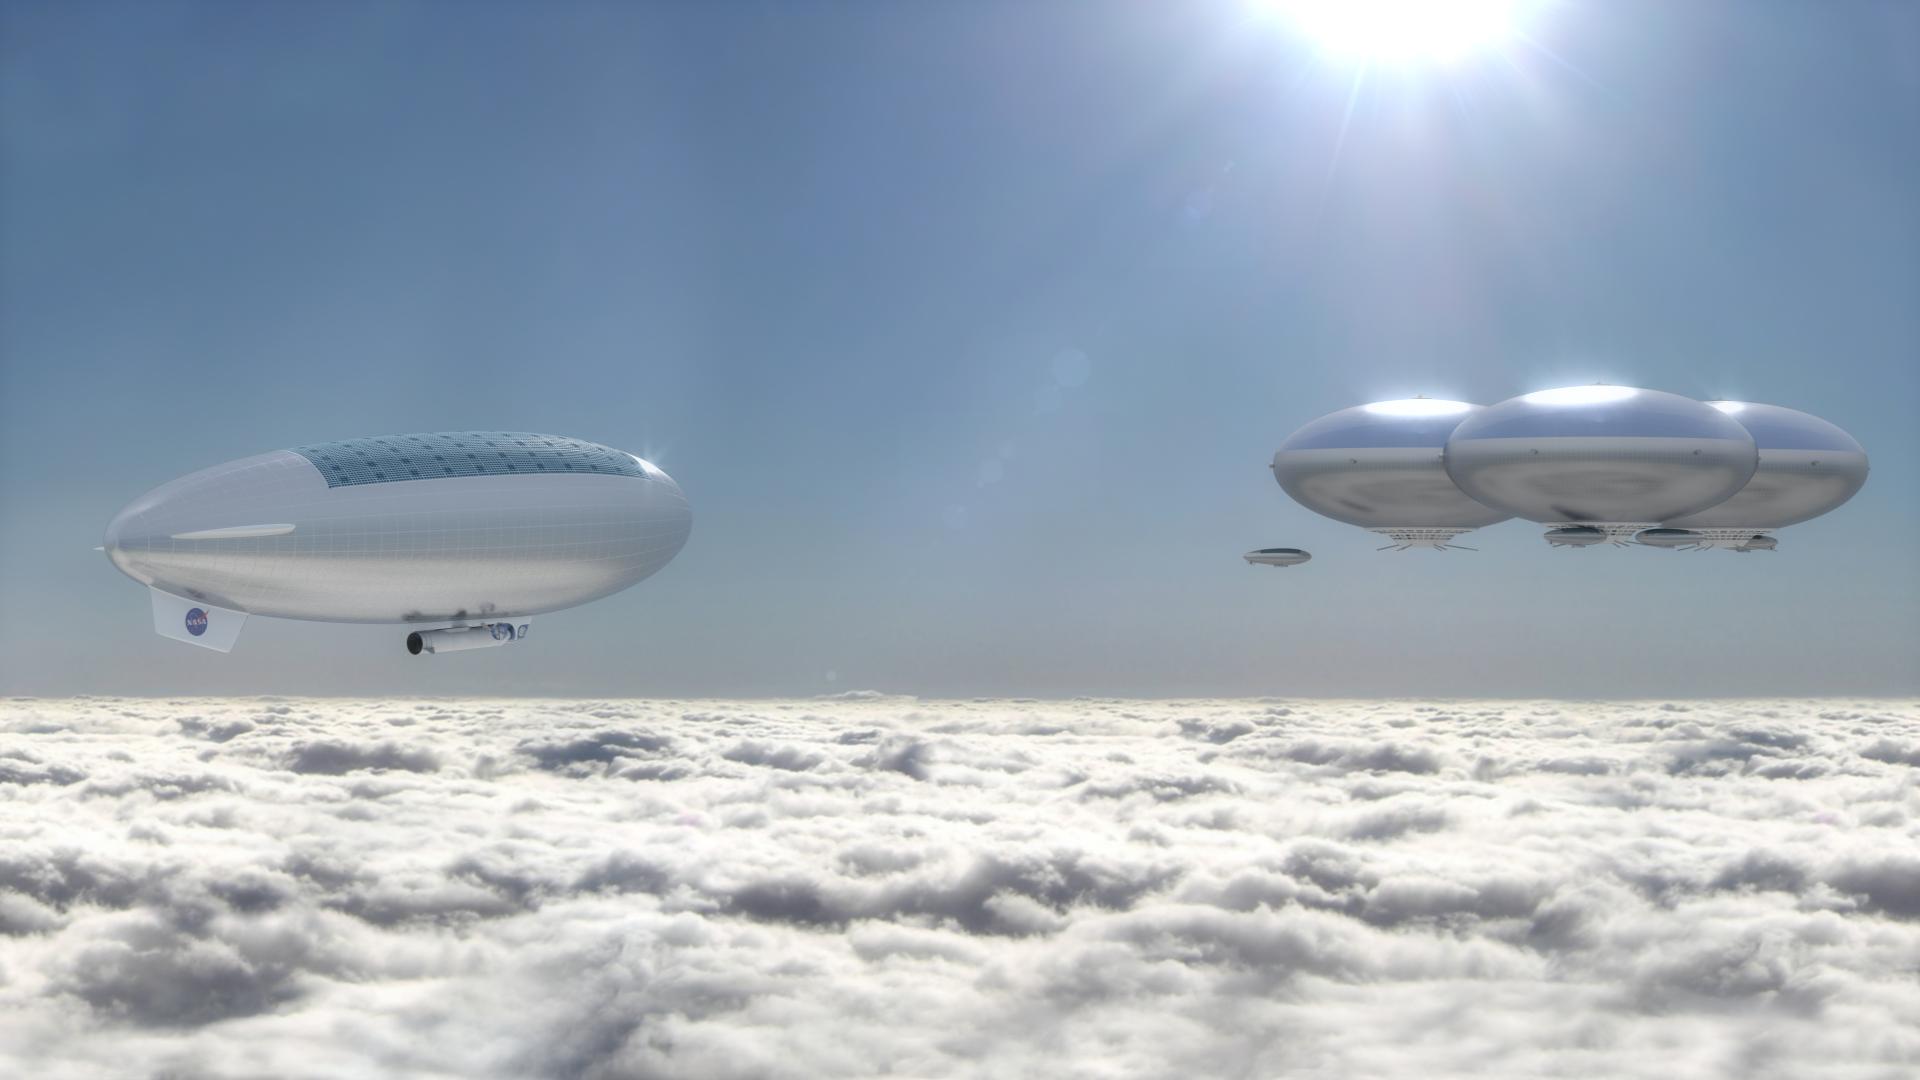 NASA to Send Humans to Venus